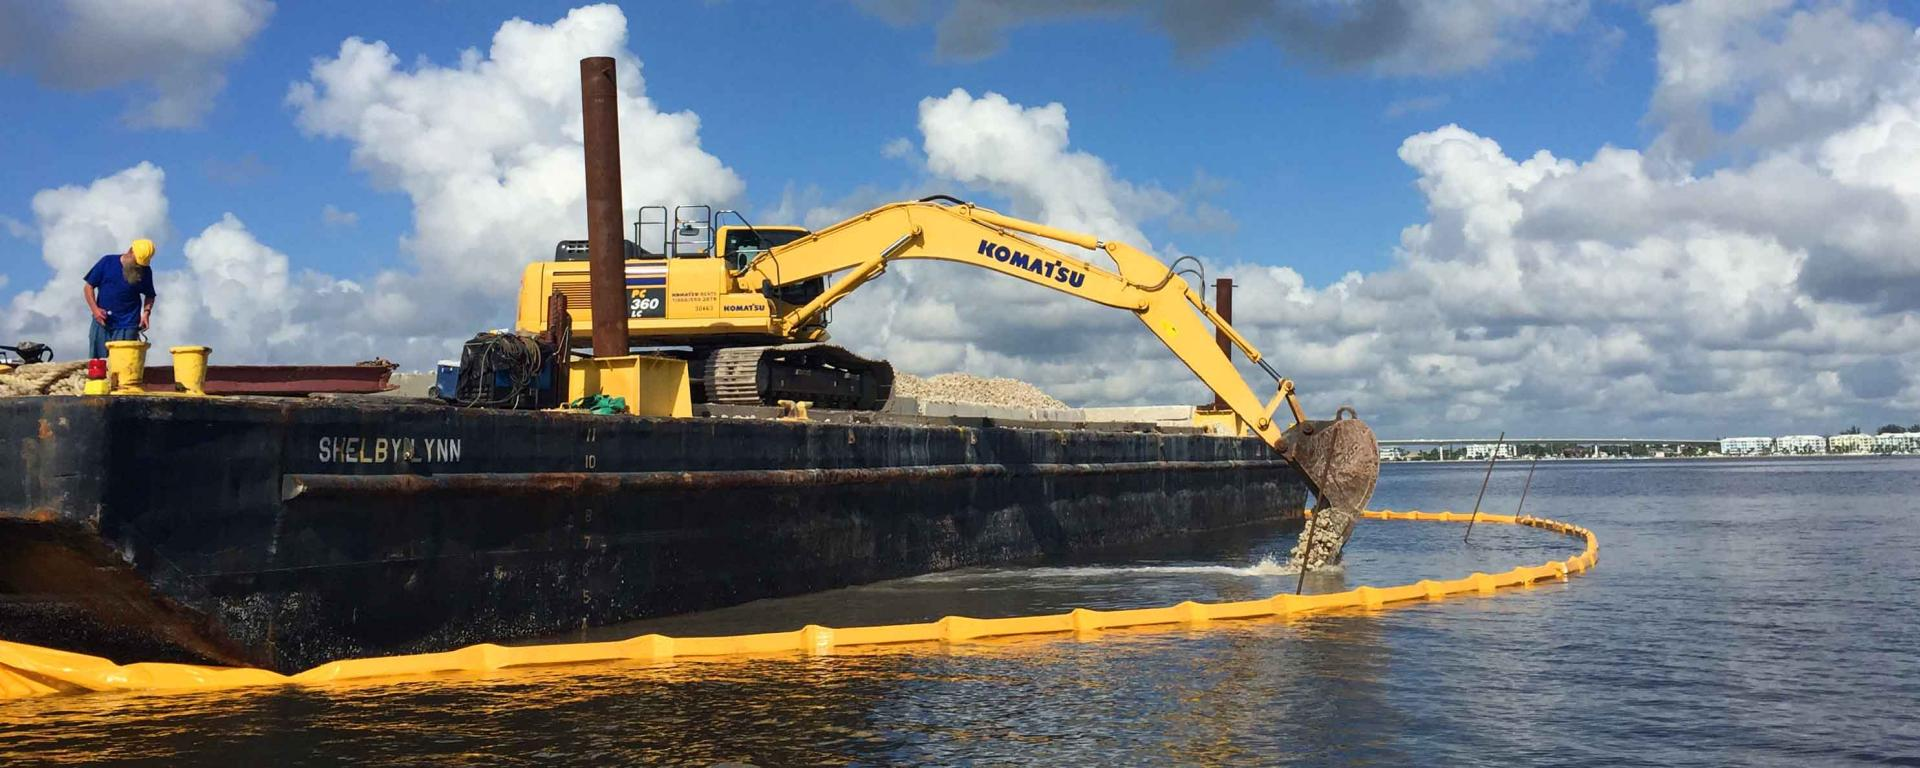 Oyster Deployement